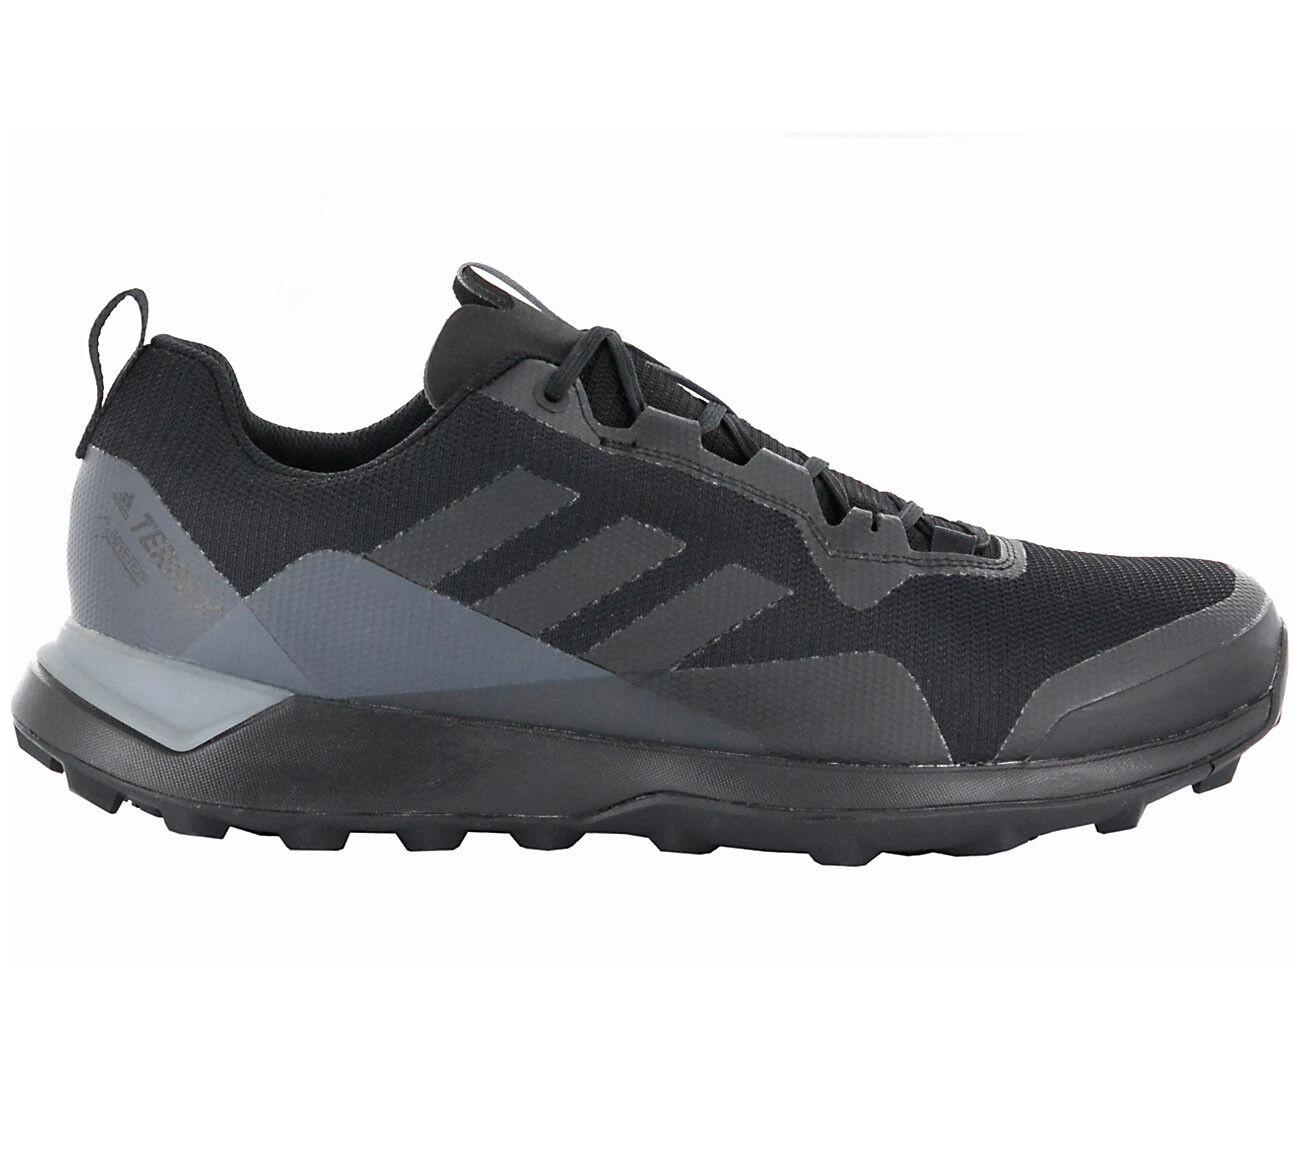 cmtk gtx gore tex chaussures adidas by2770 terrex noirs by2770 adidas les chaussures de randonnée sentier 5a61f9